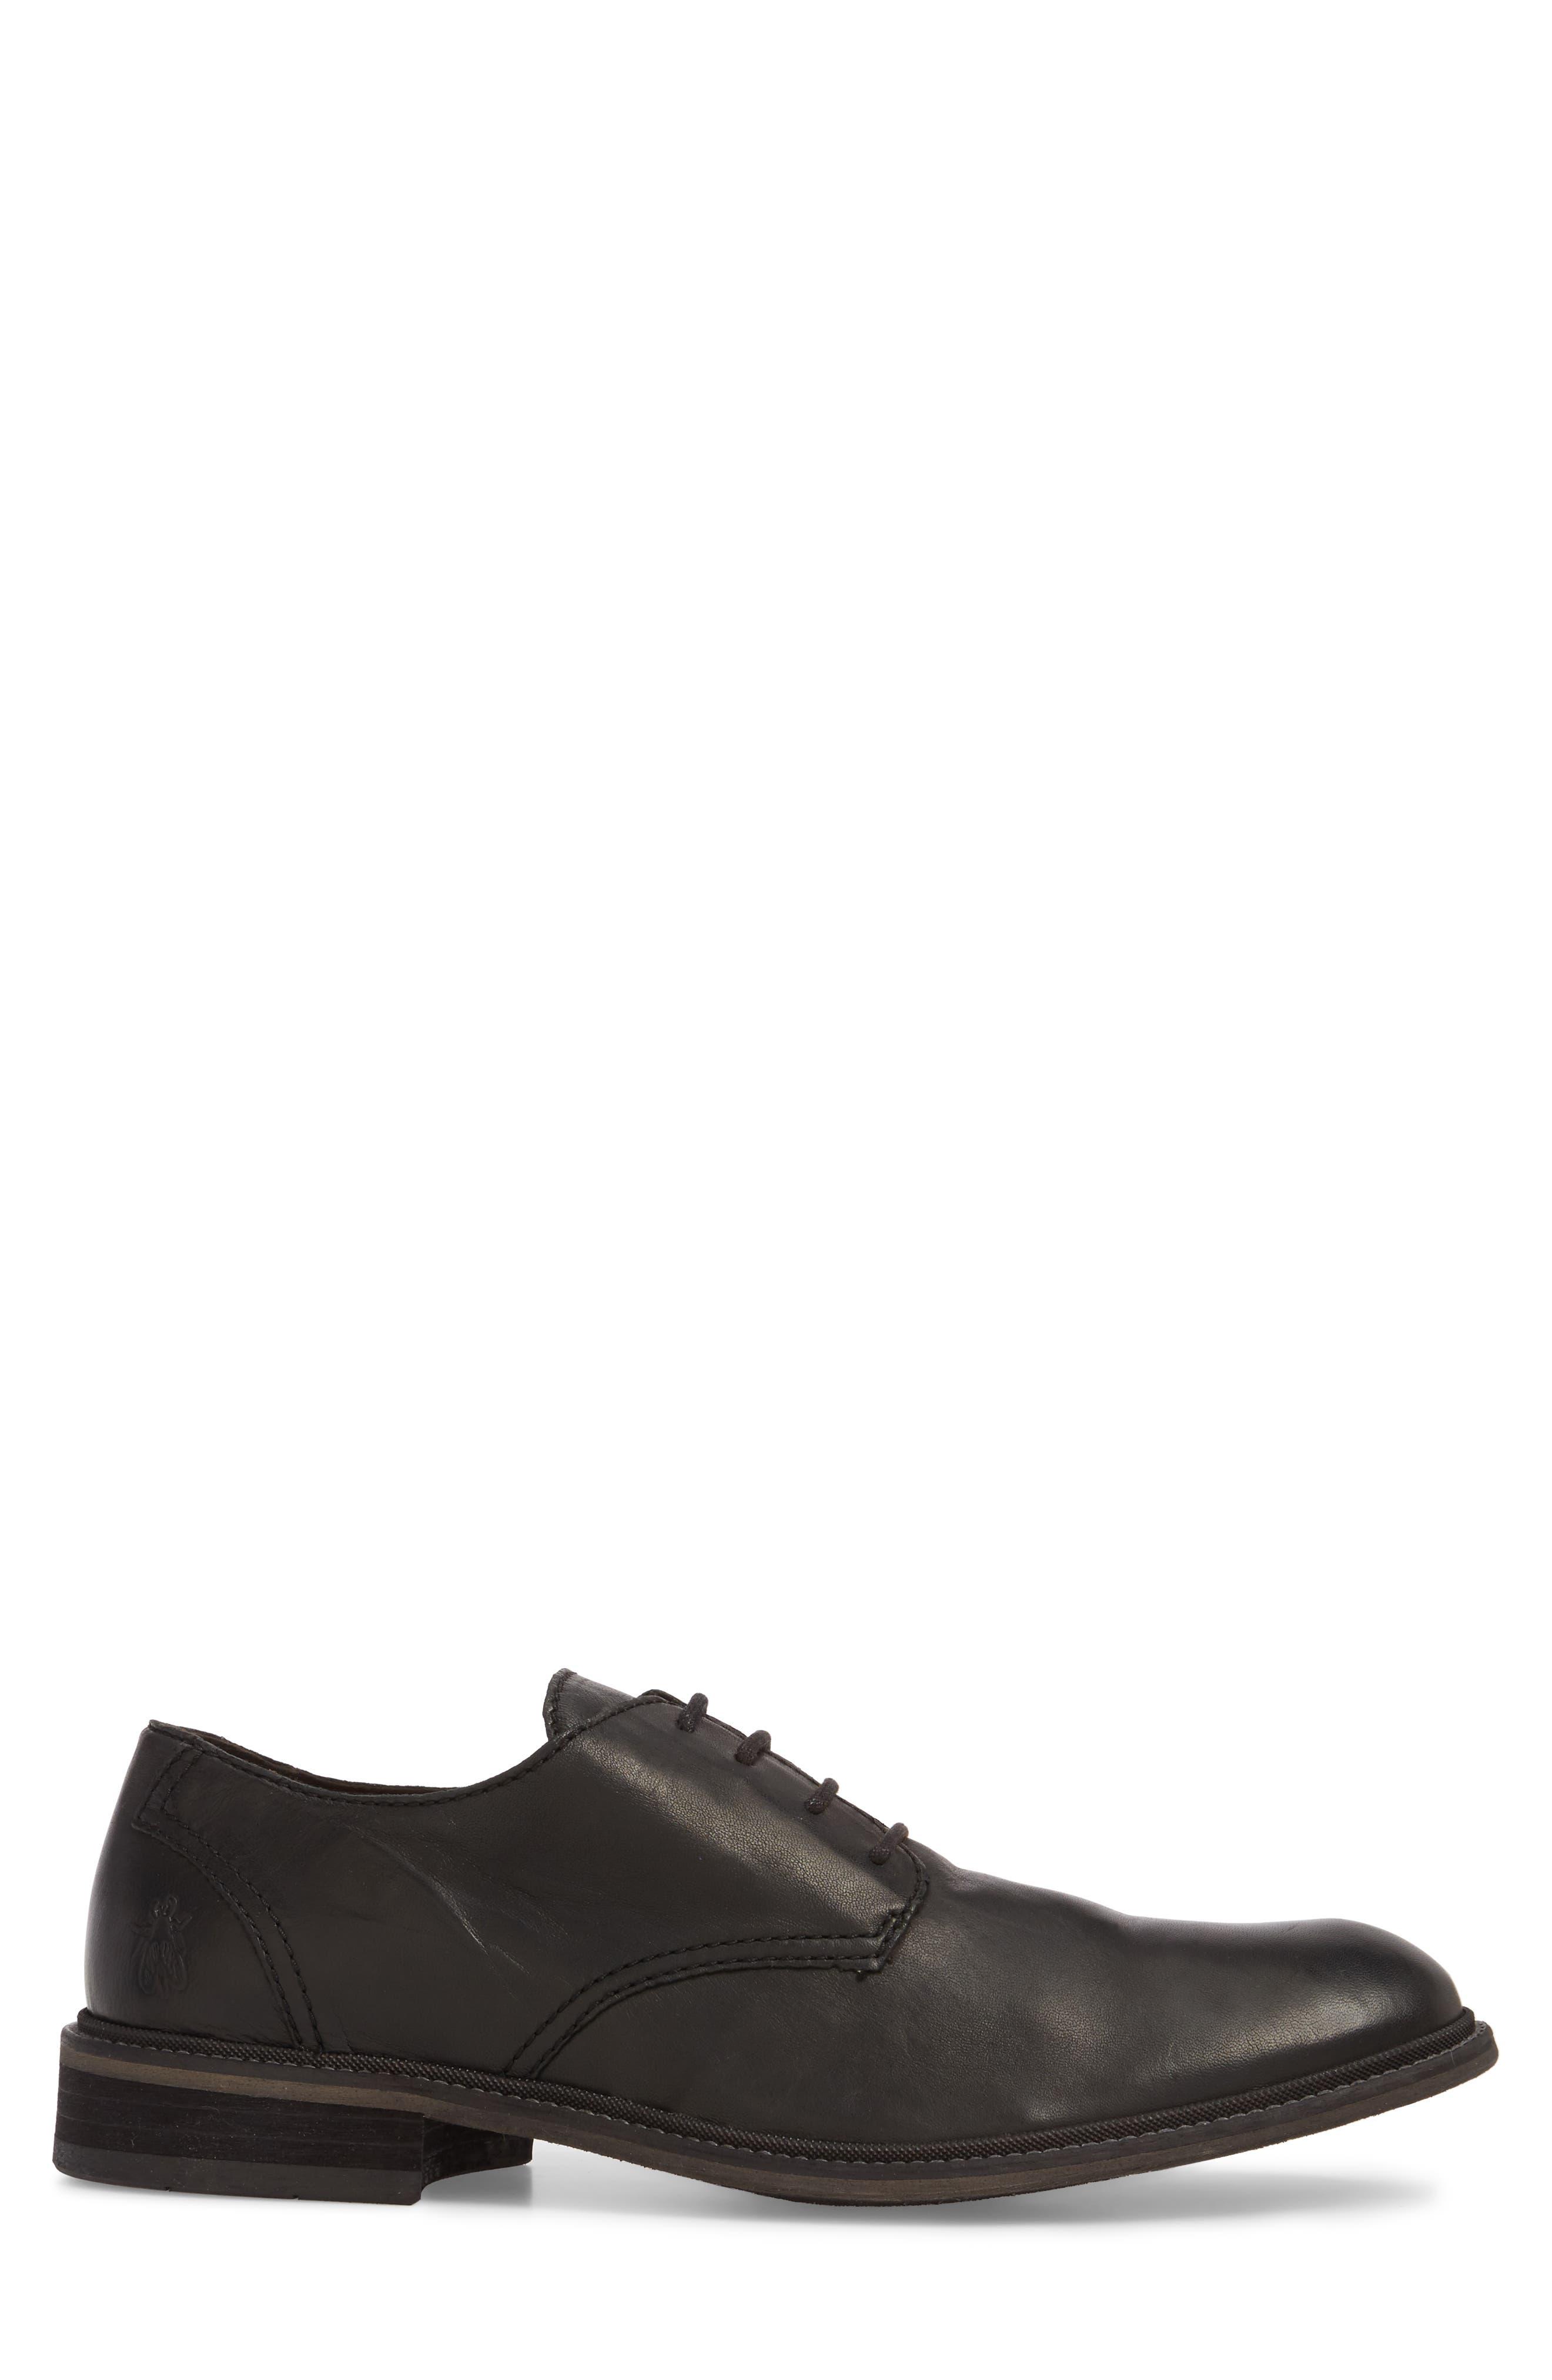 Hoco Plain Toe Derby,                             Alternate thumbnail 3, color,                             Black Leather